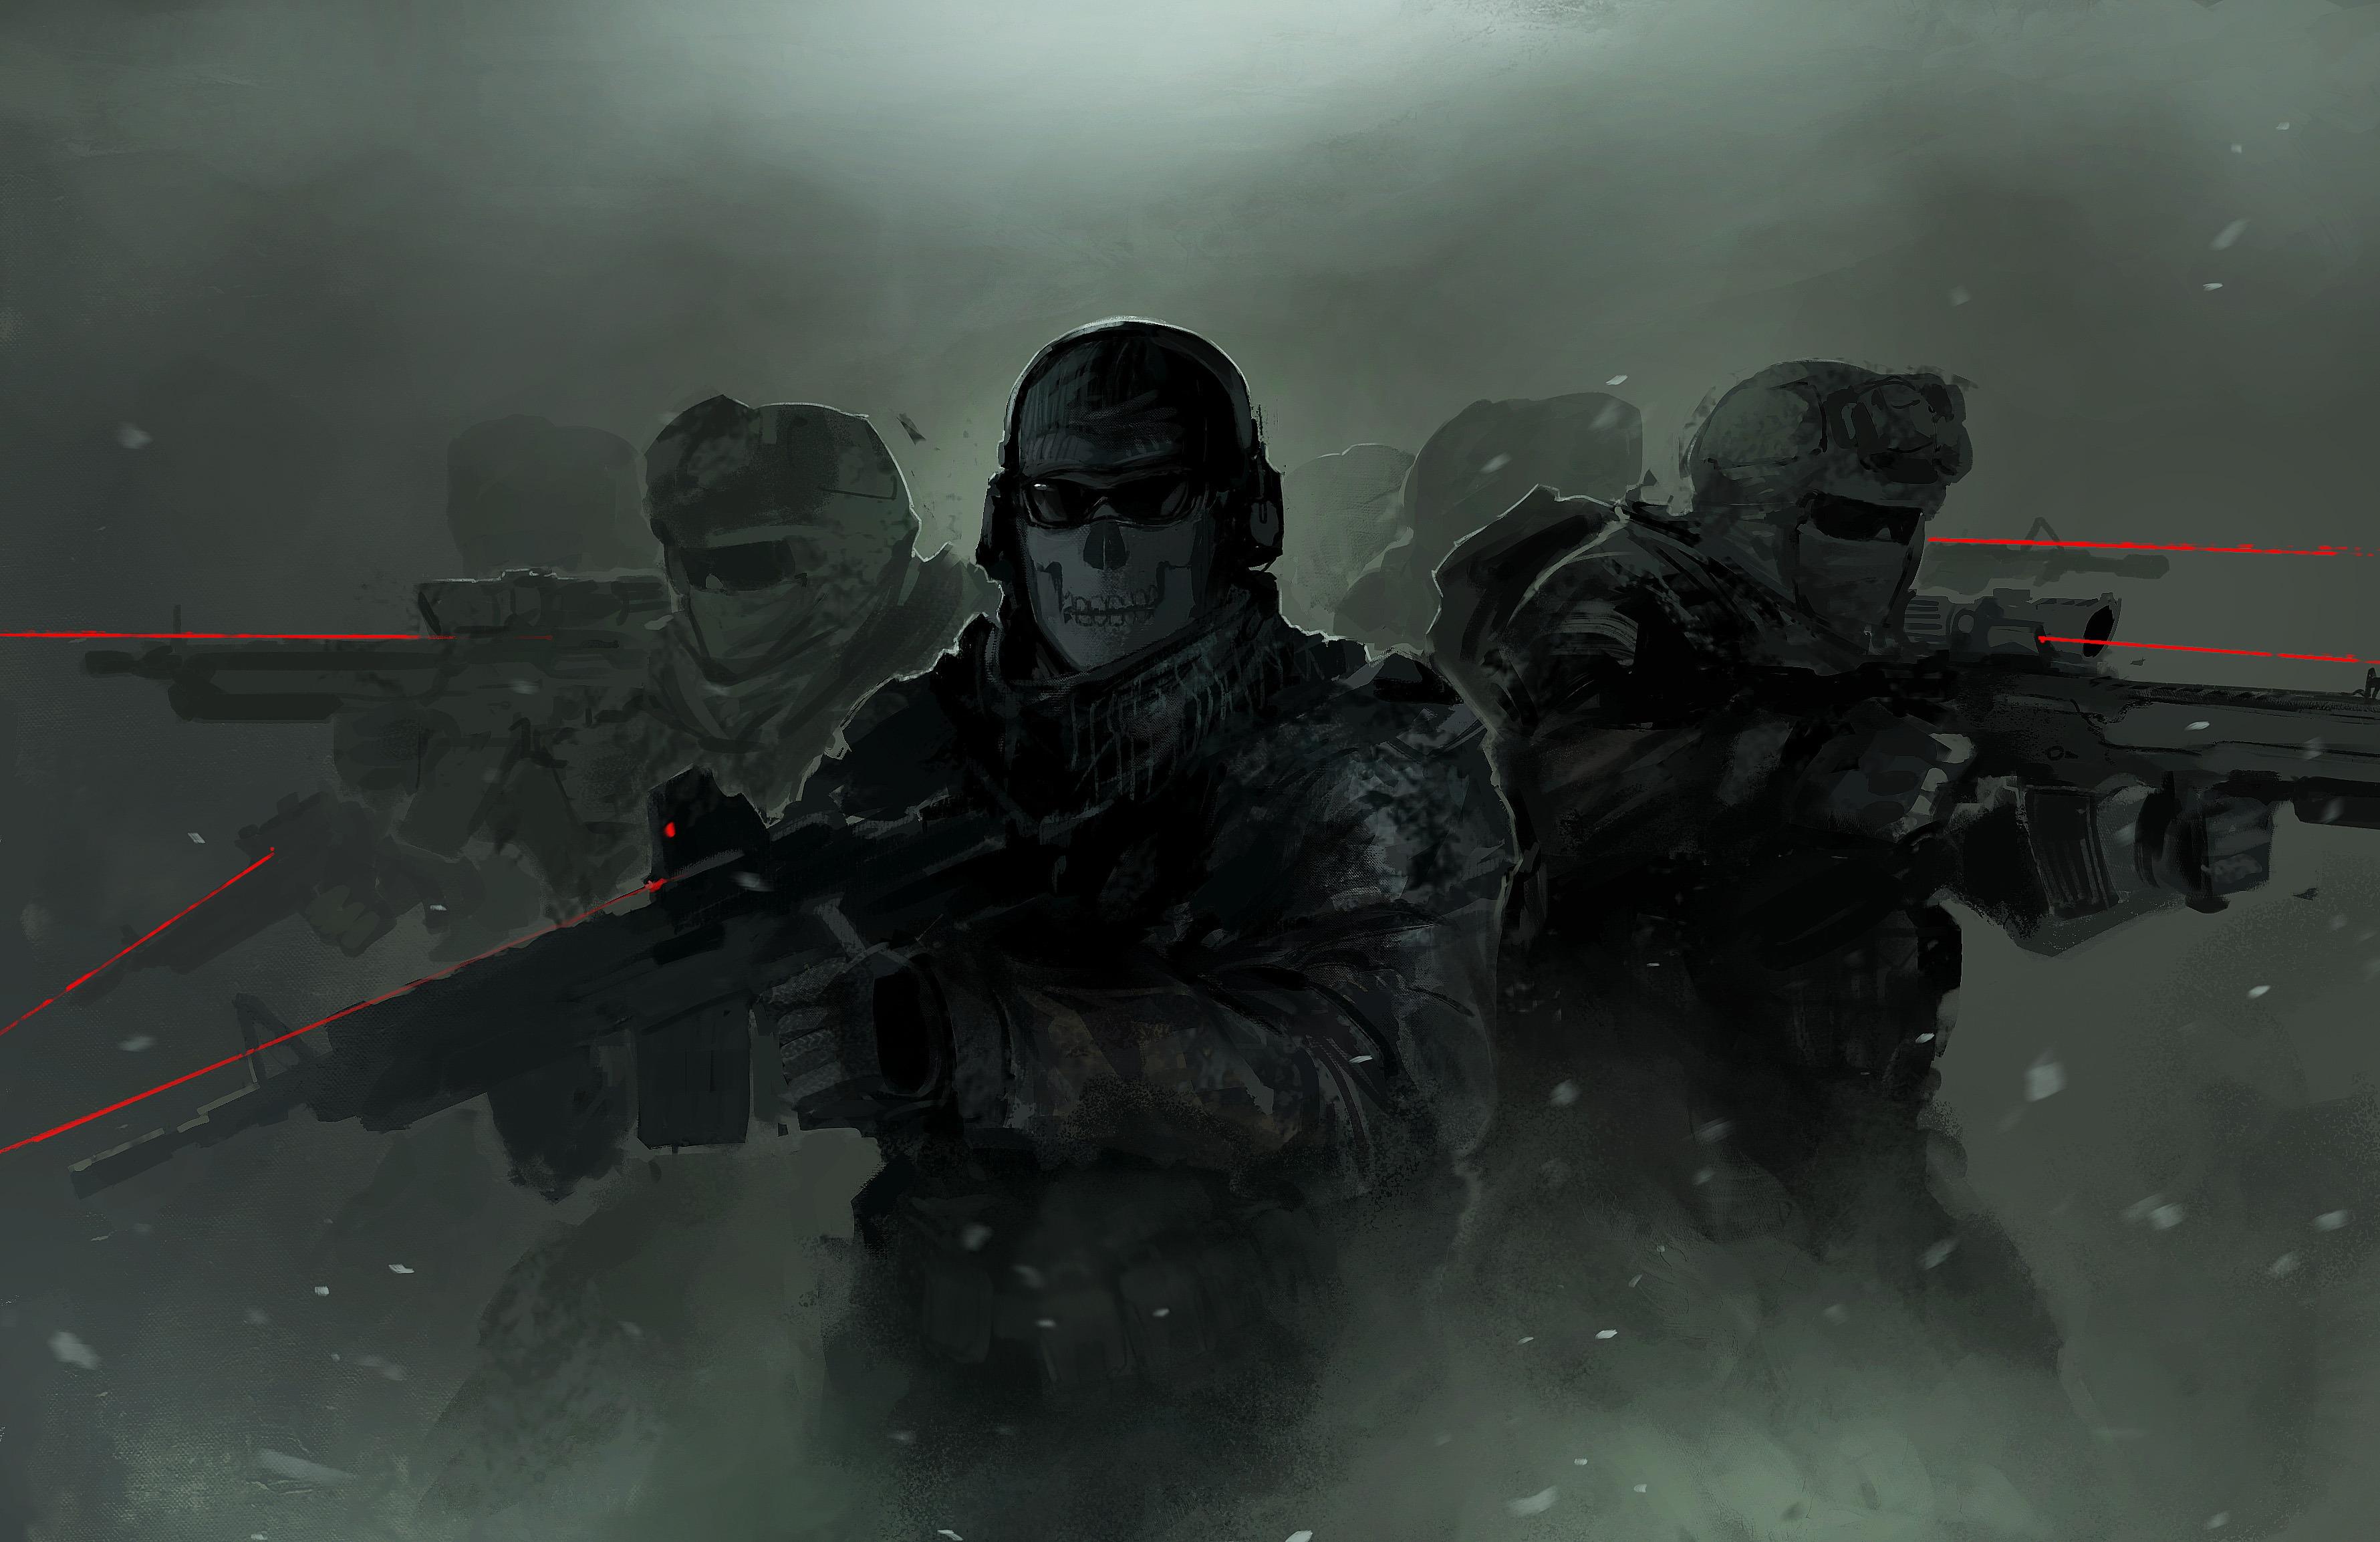 call of duty: modern warfare 2 hd wallpaper   background image